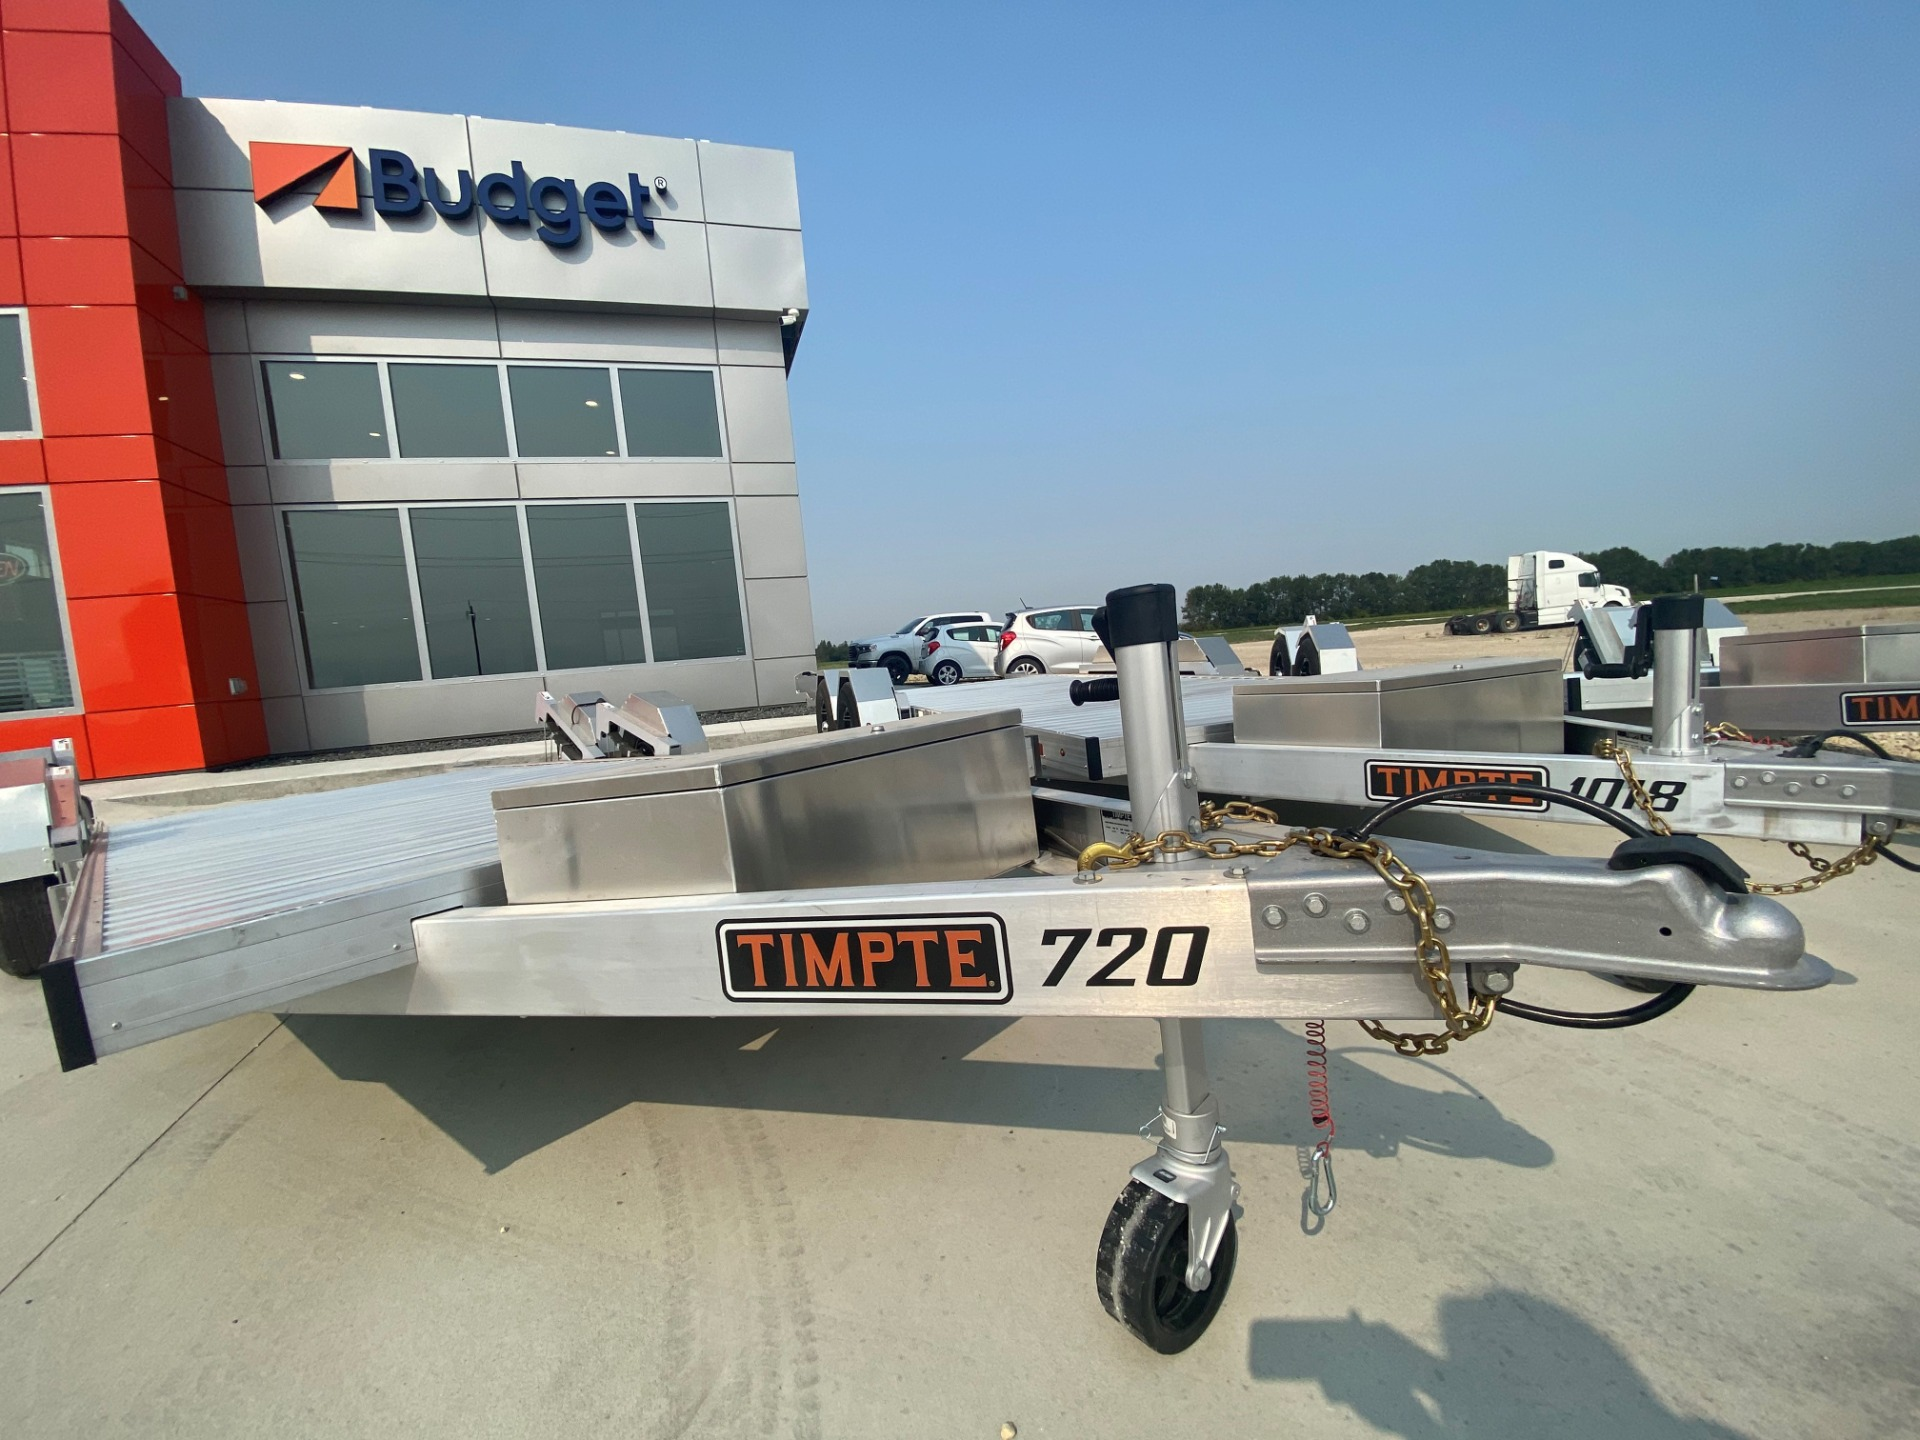 2022 Timpte 720 Utility Trailer for sale $13,200 at BP Motors in Morden MB R6M 1Y9 1